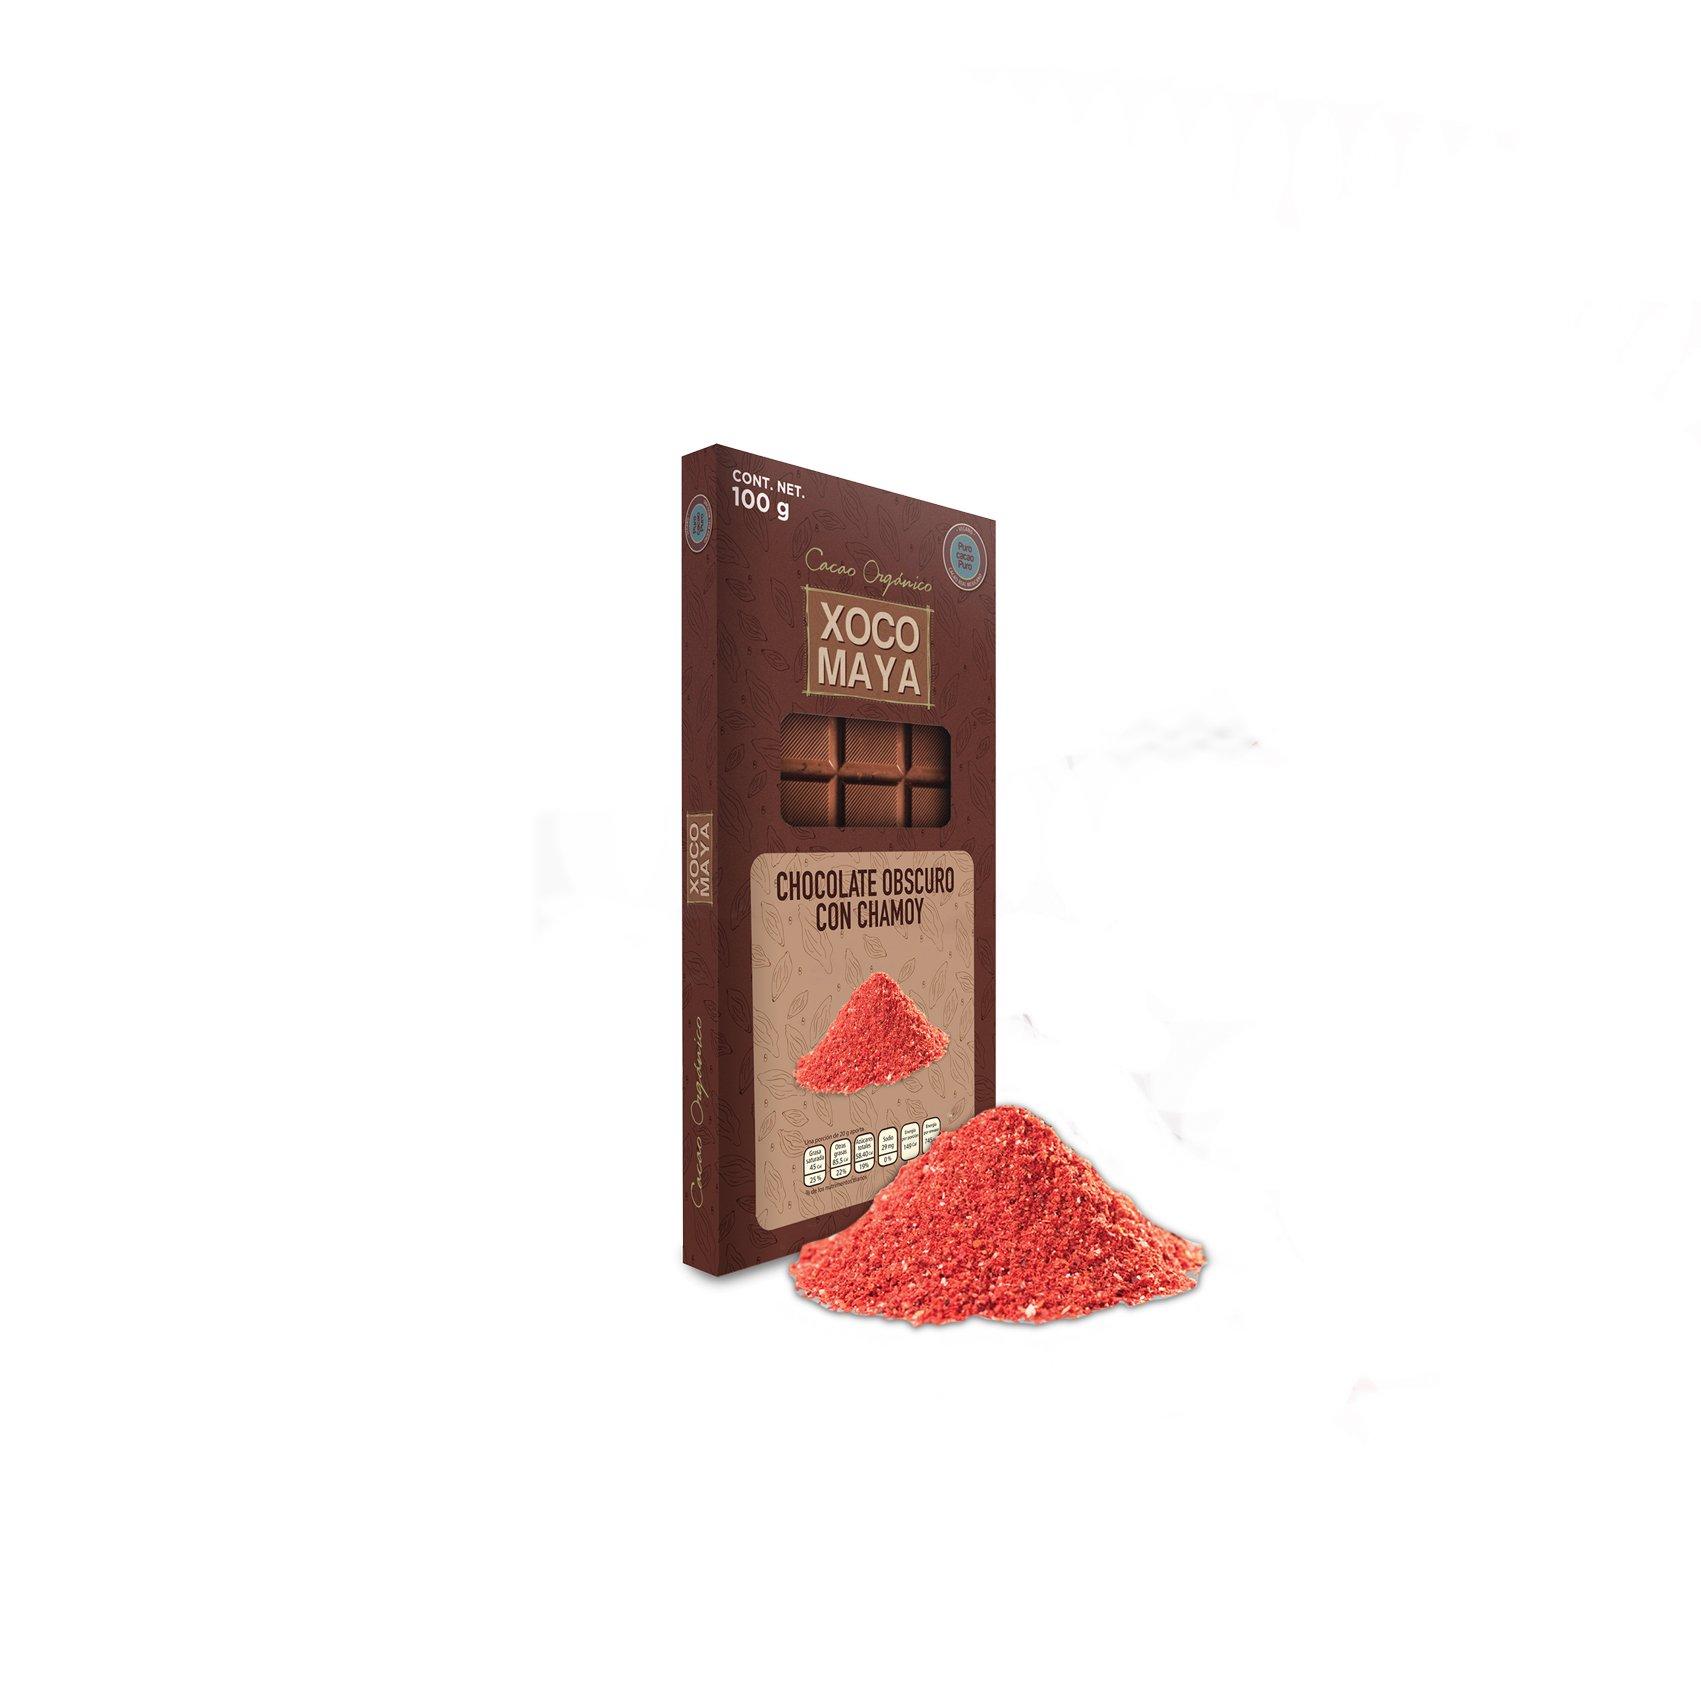 Barra de Chocolate con Chamoy de Xocomaya